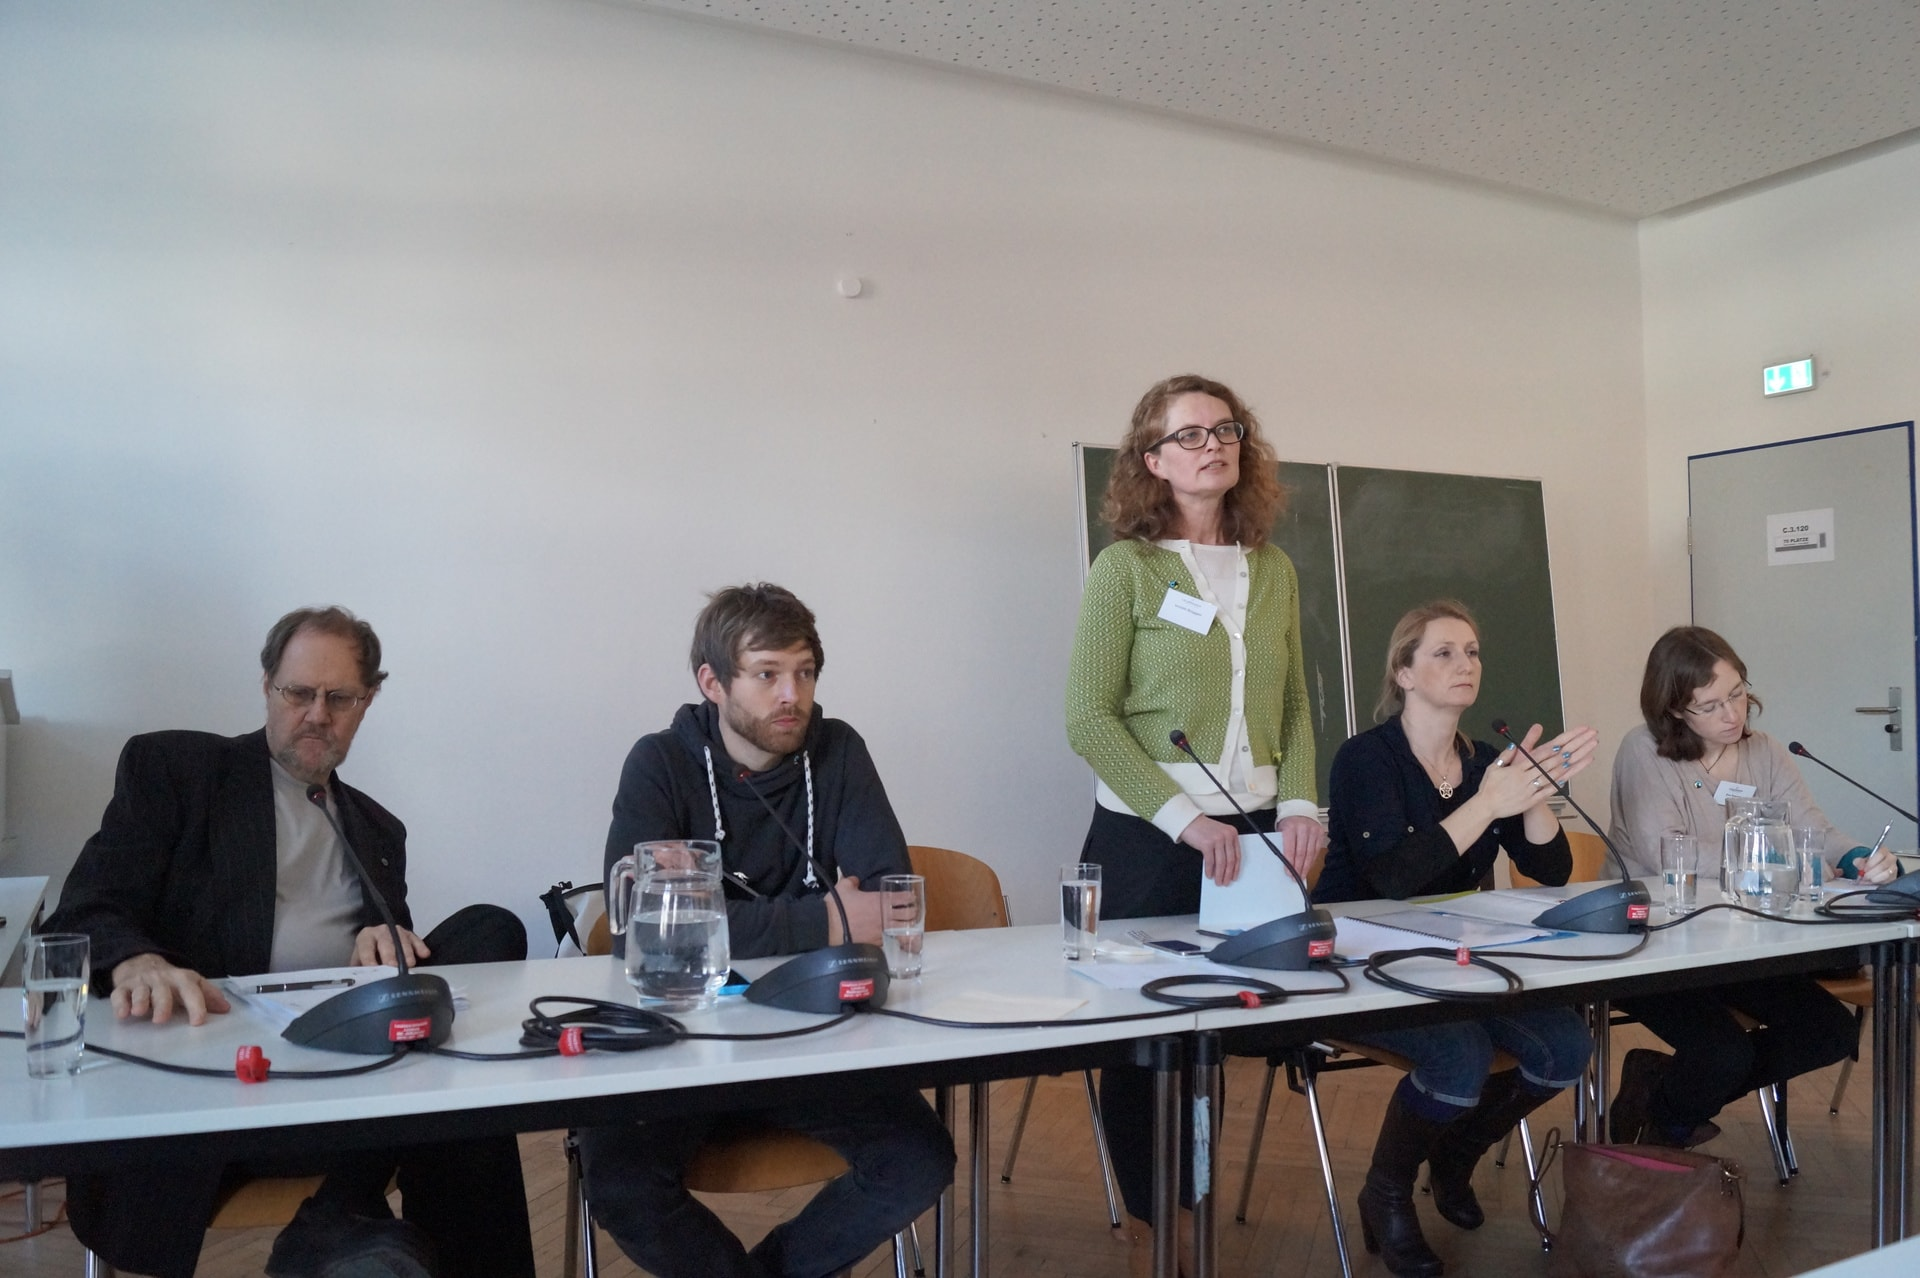 Podiumsdiskussion über Fairtrade Universität / (C) Christopher Bohlens